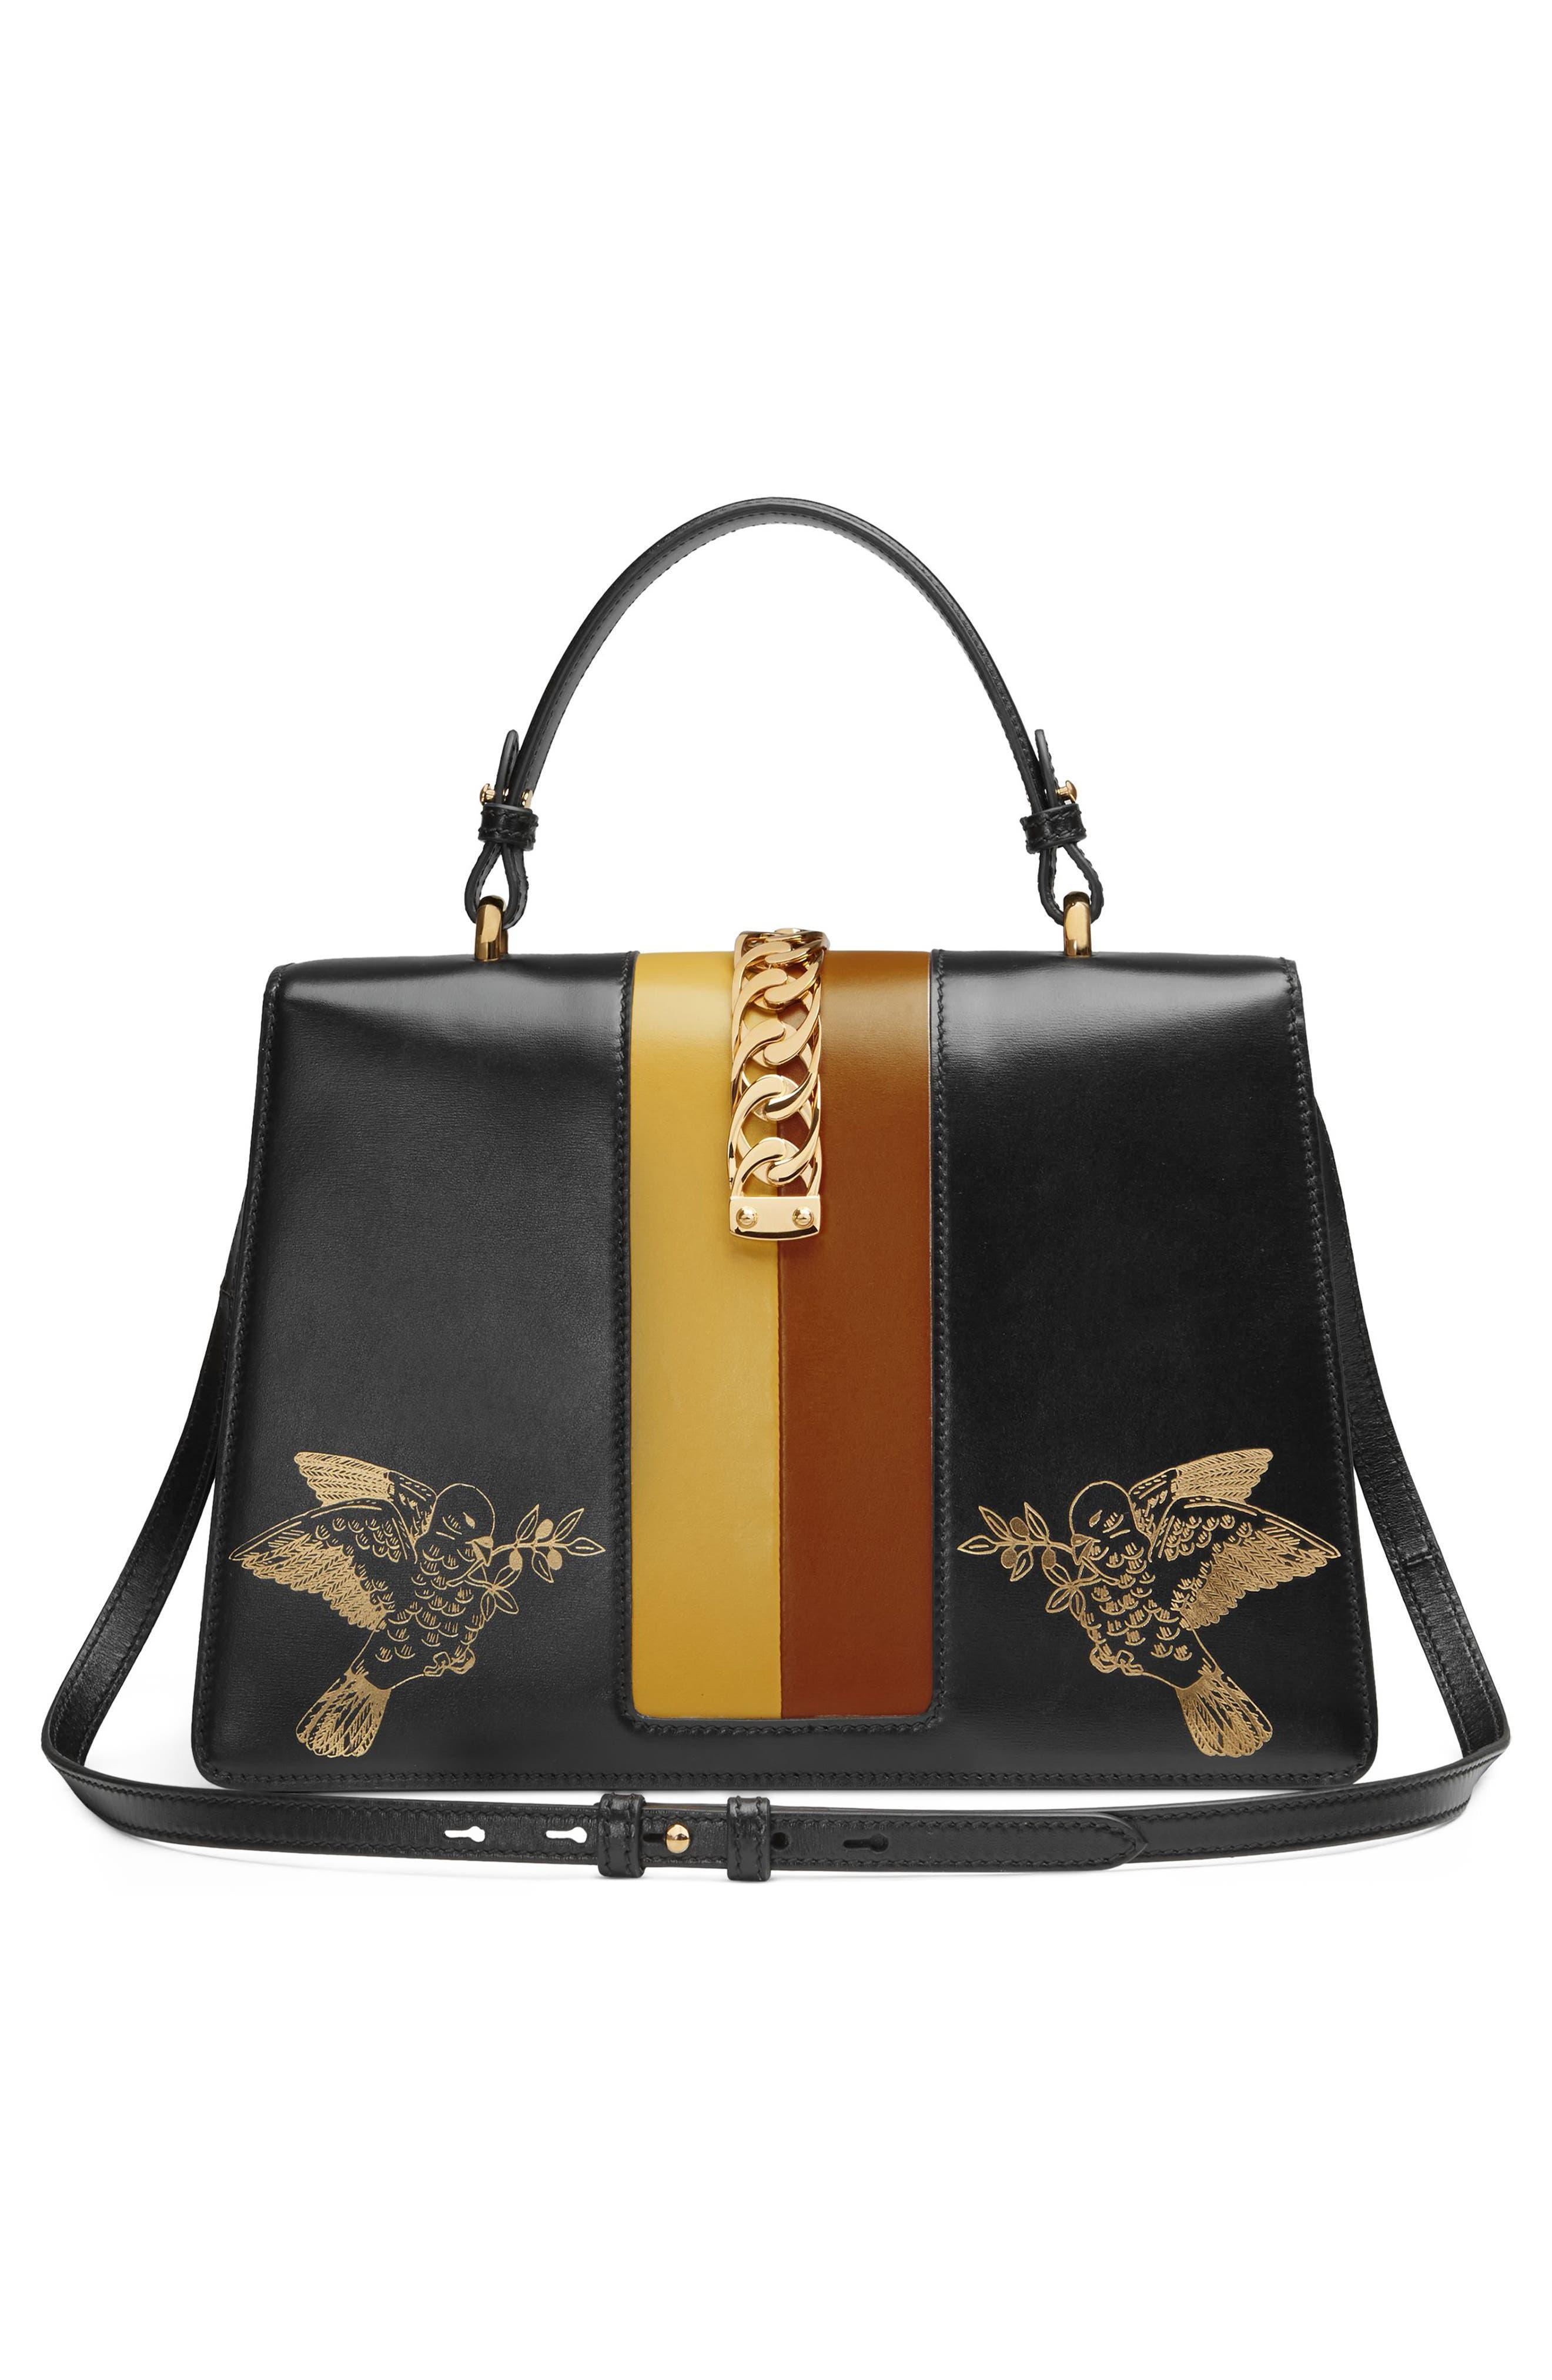 Medium Sylvie Top Handle Leather Bag,                             Alternate thumbnail 2, color,                             BLACK GOLD/ CARAMEL/ OCHRE